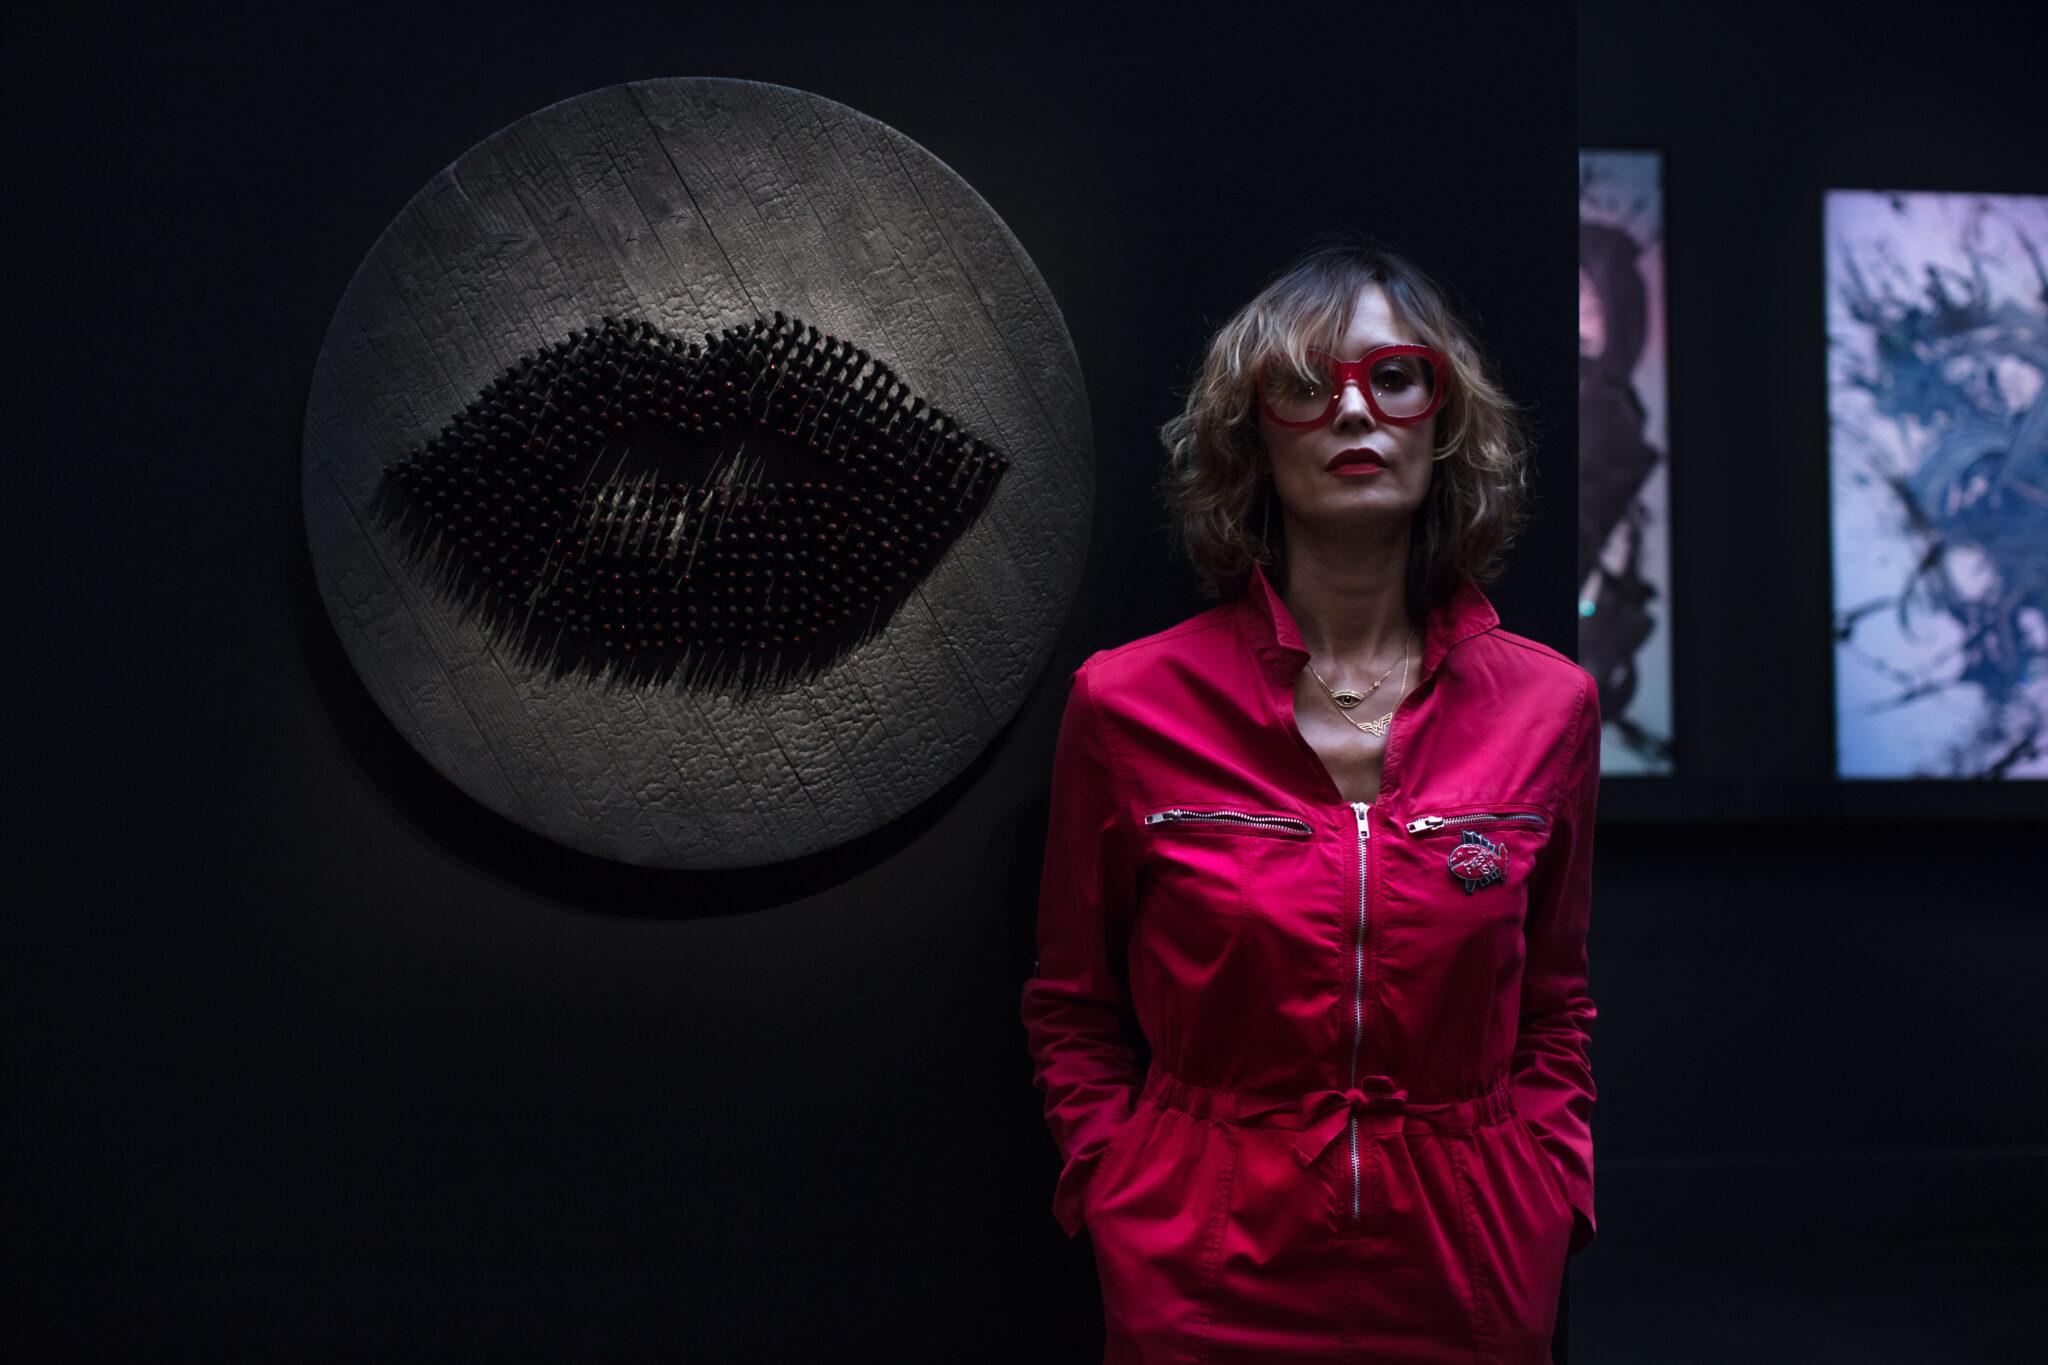 audrey-hatchikian-gallery-expo-momentum-paris